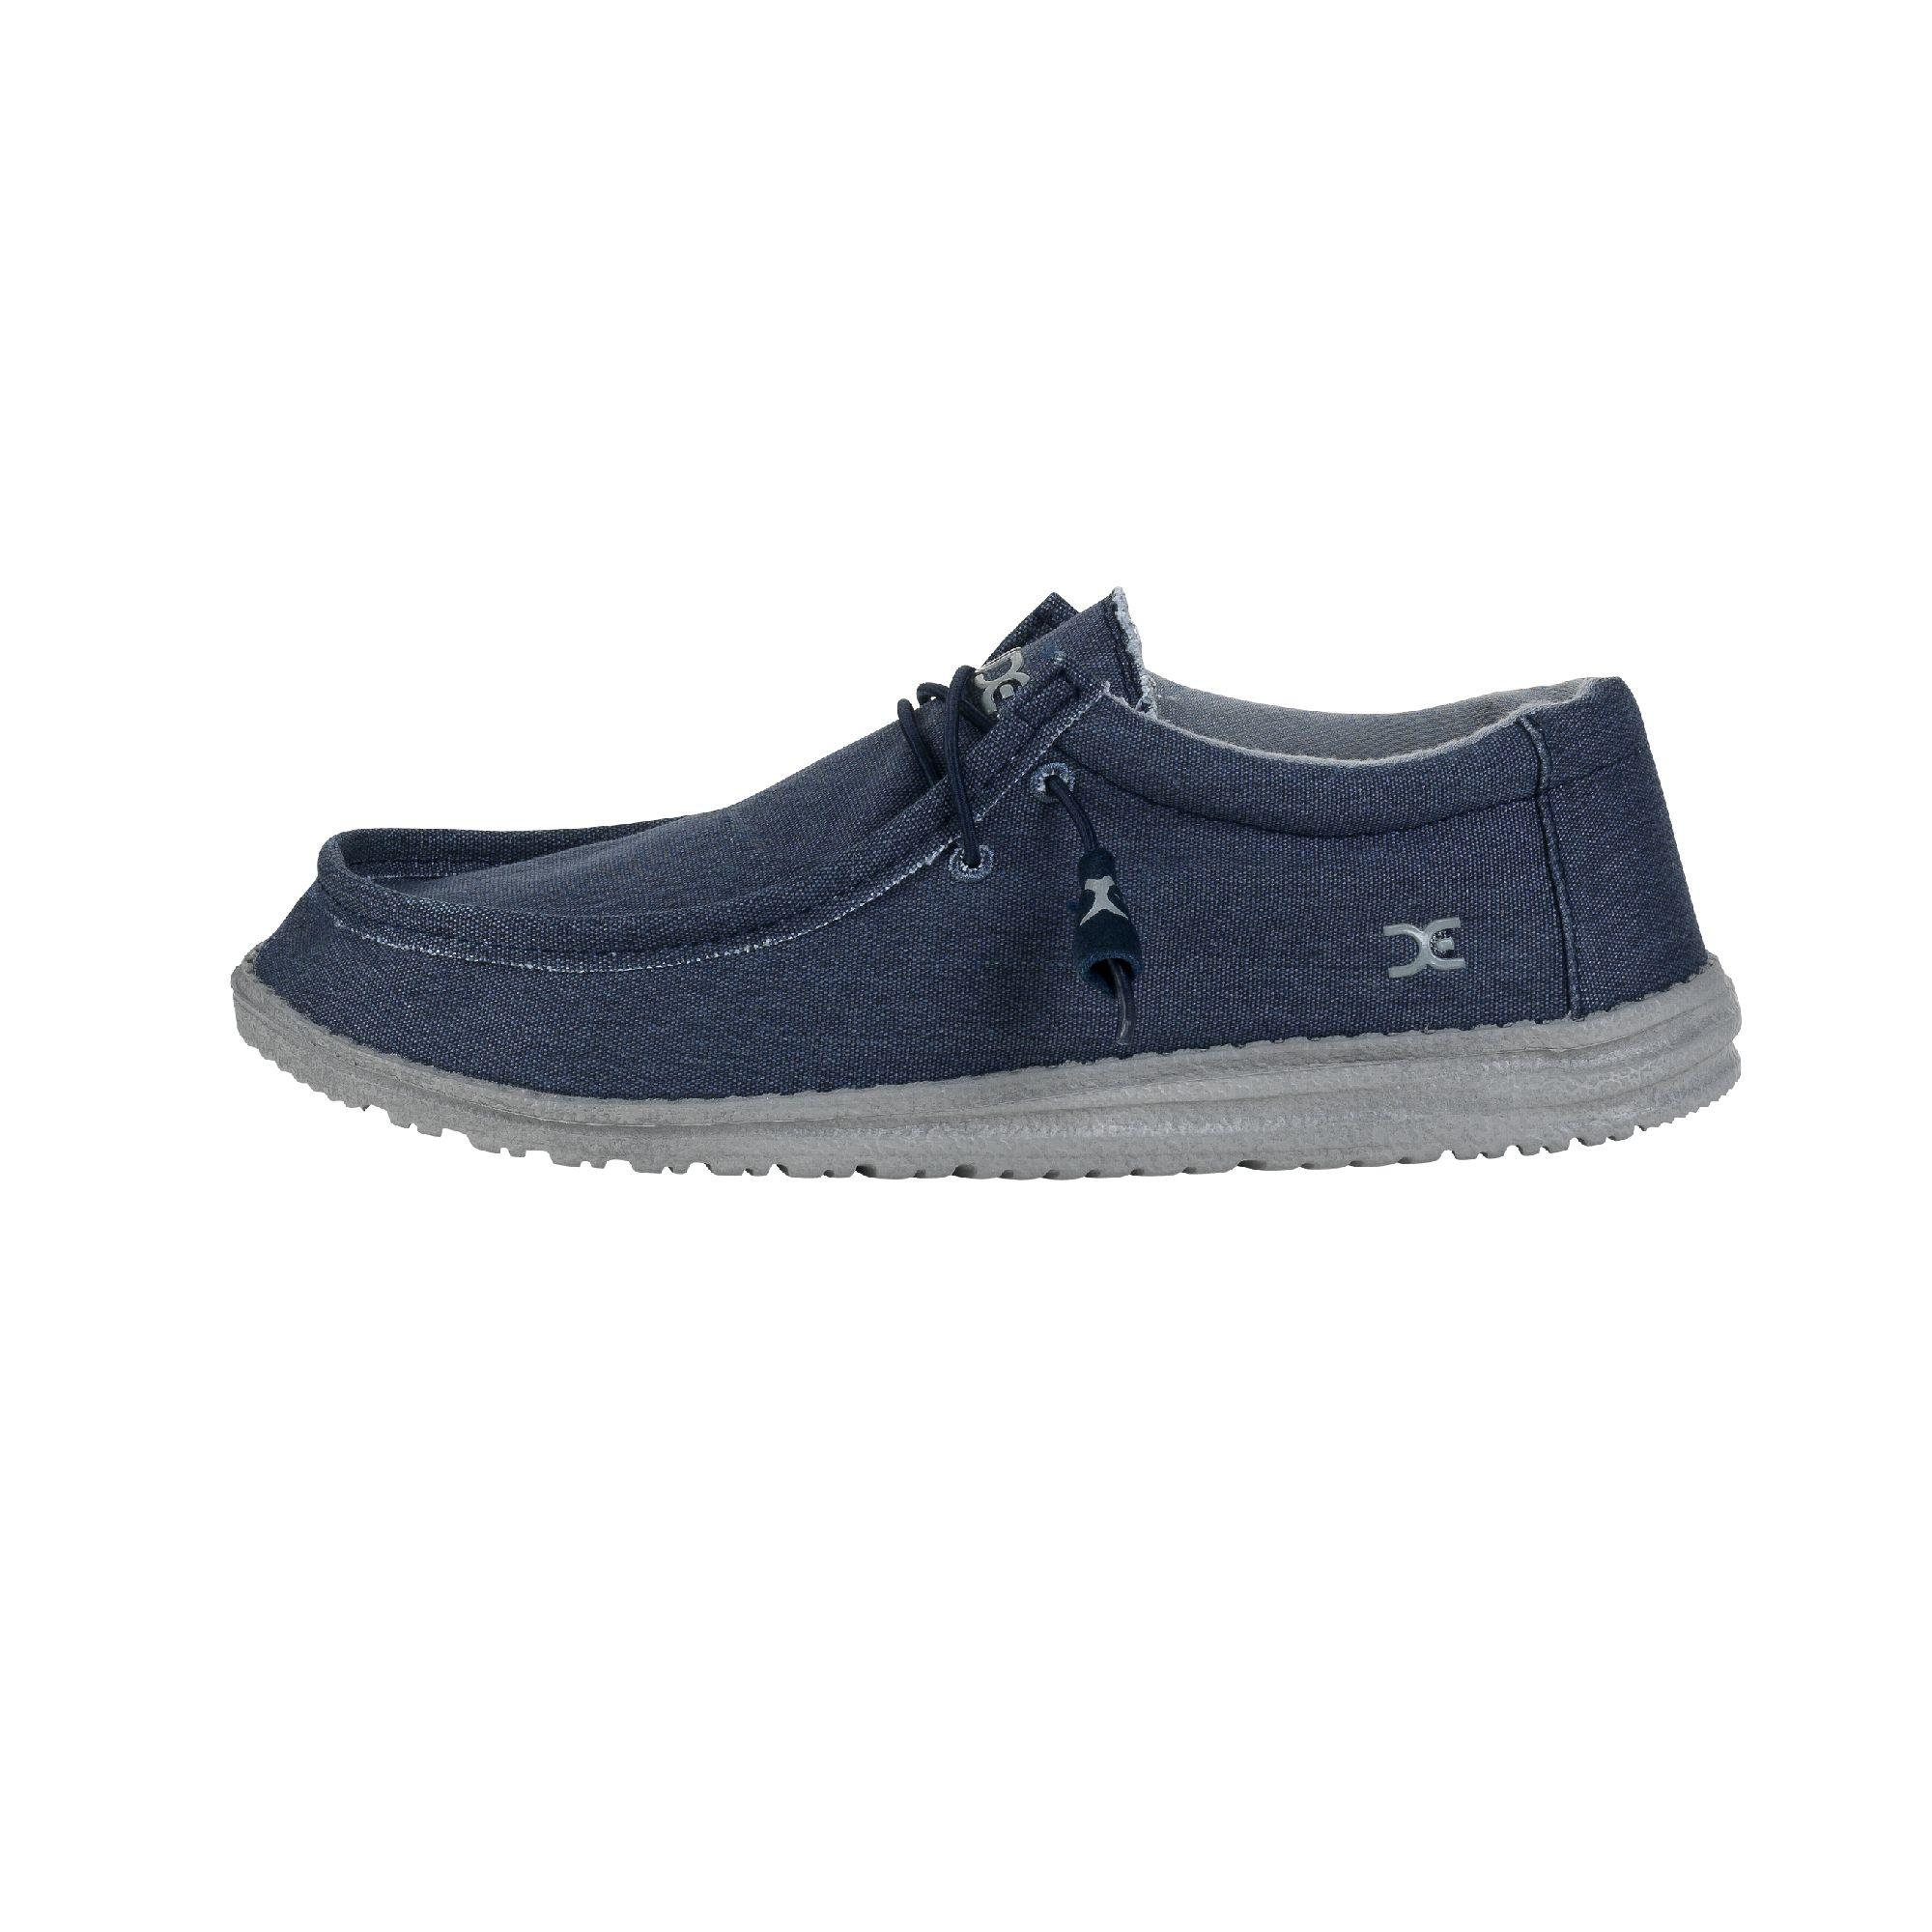 Dude Shoes Men's Volterra Canvas Navy Derby Shoe UK11 / EU45 27ECG